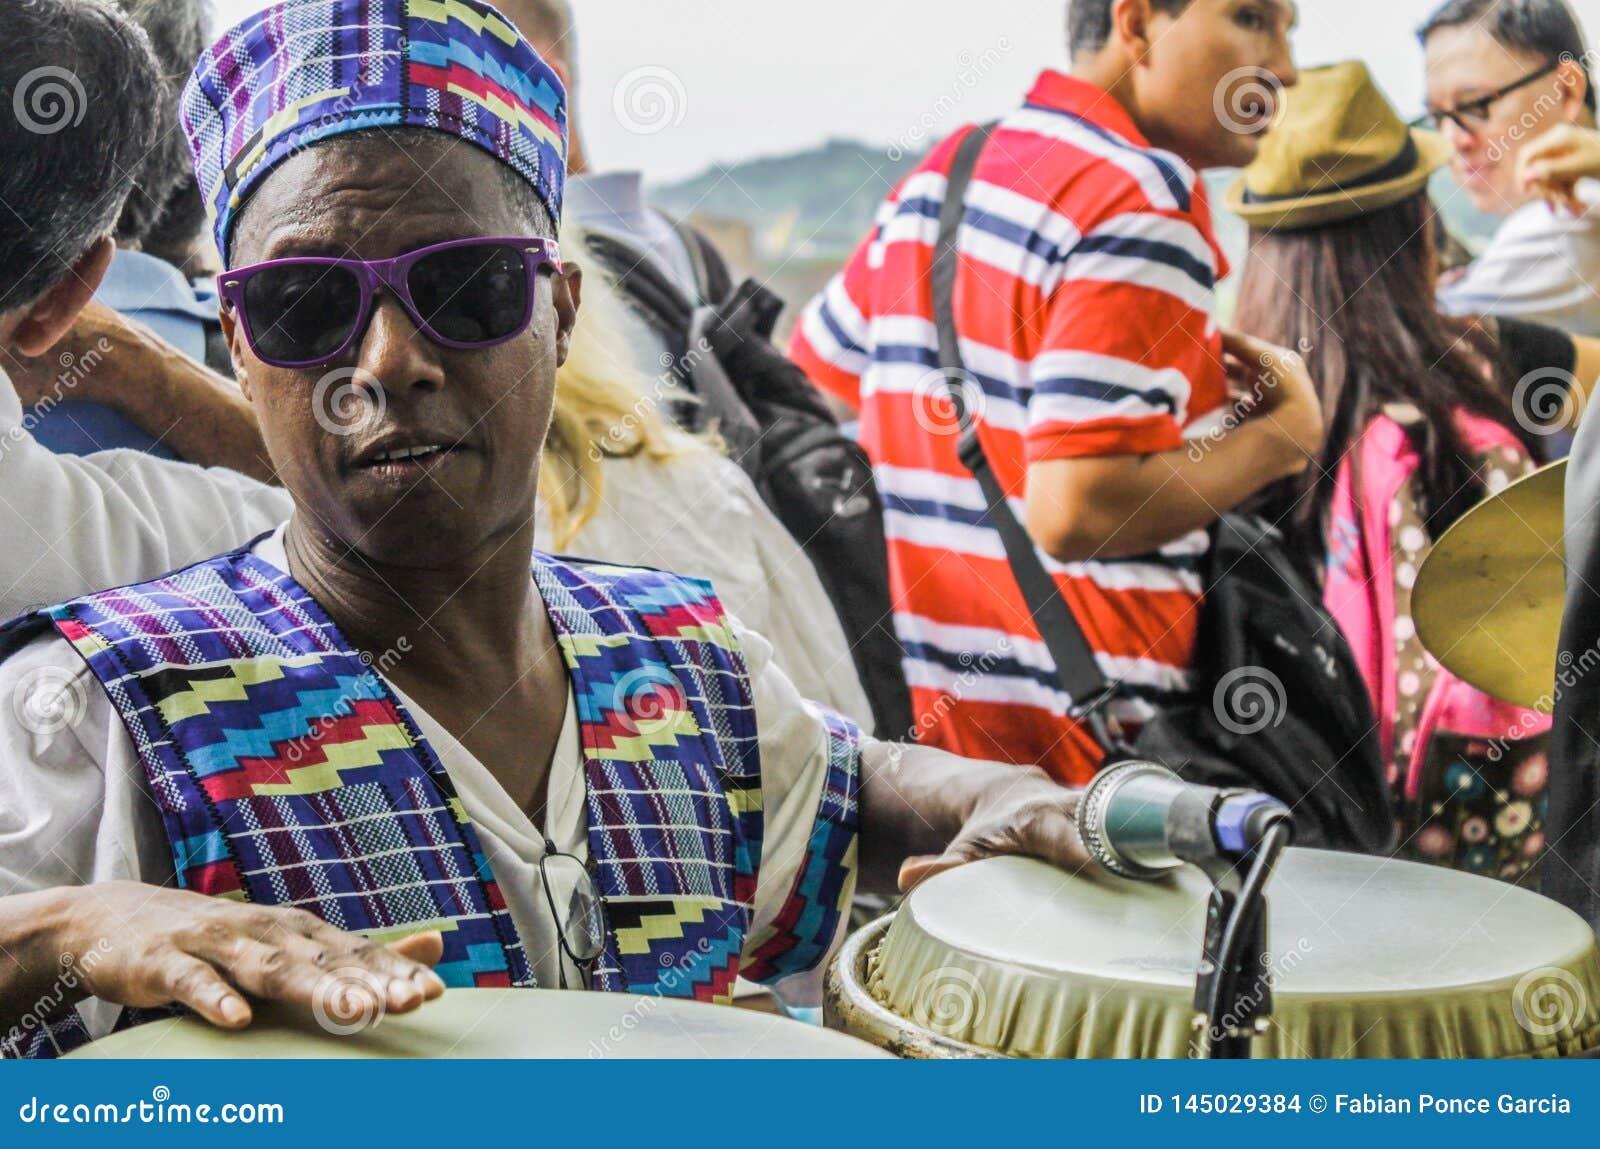 A Cidade do Panamá, Panamá, o 15 de agosto de 2015 Close-up do músico afro-americano